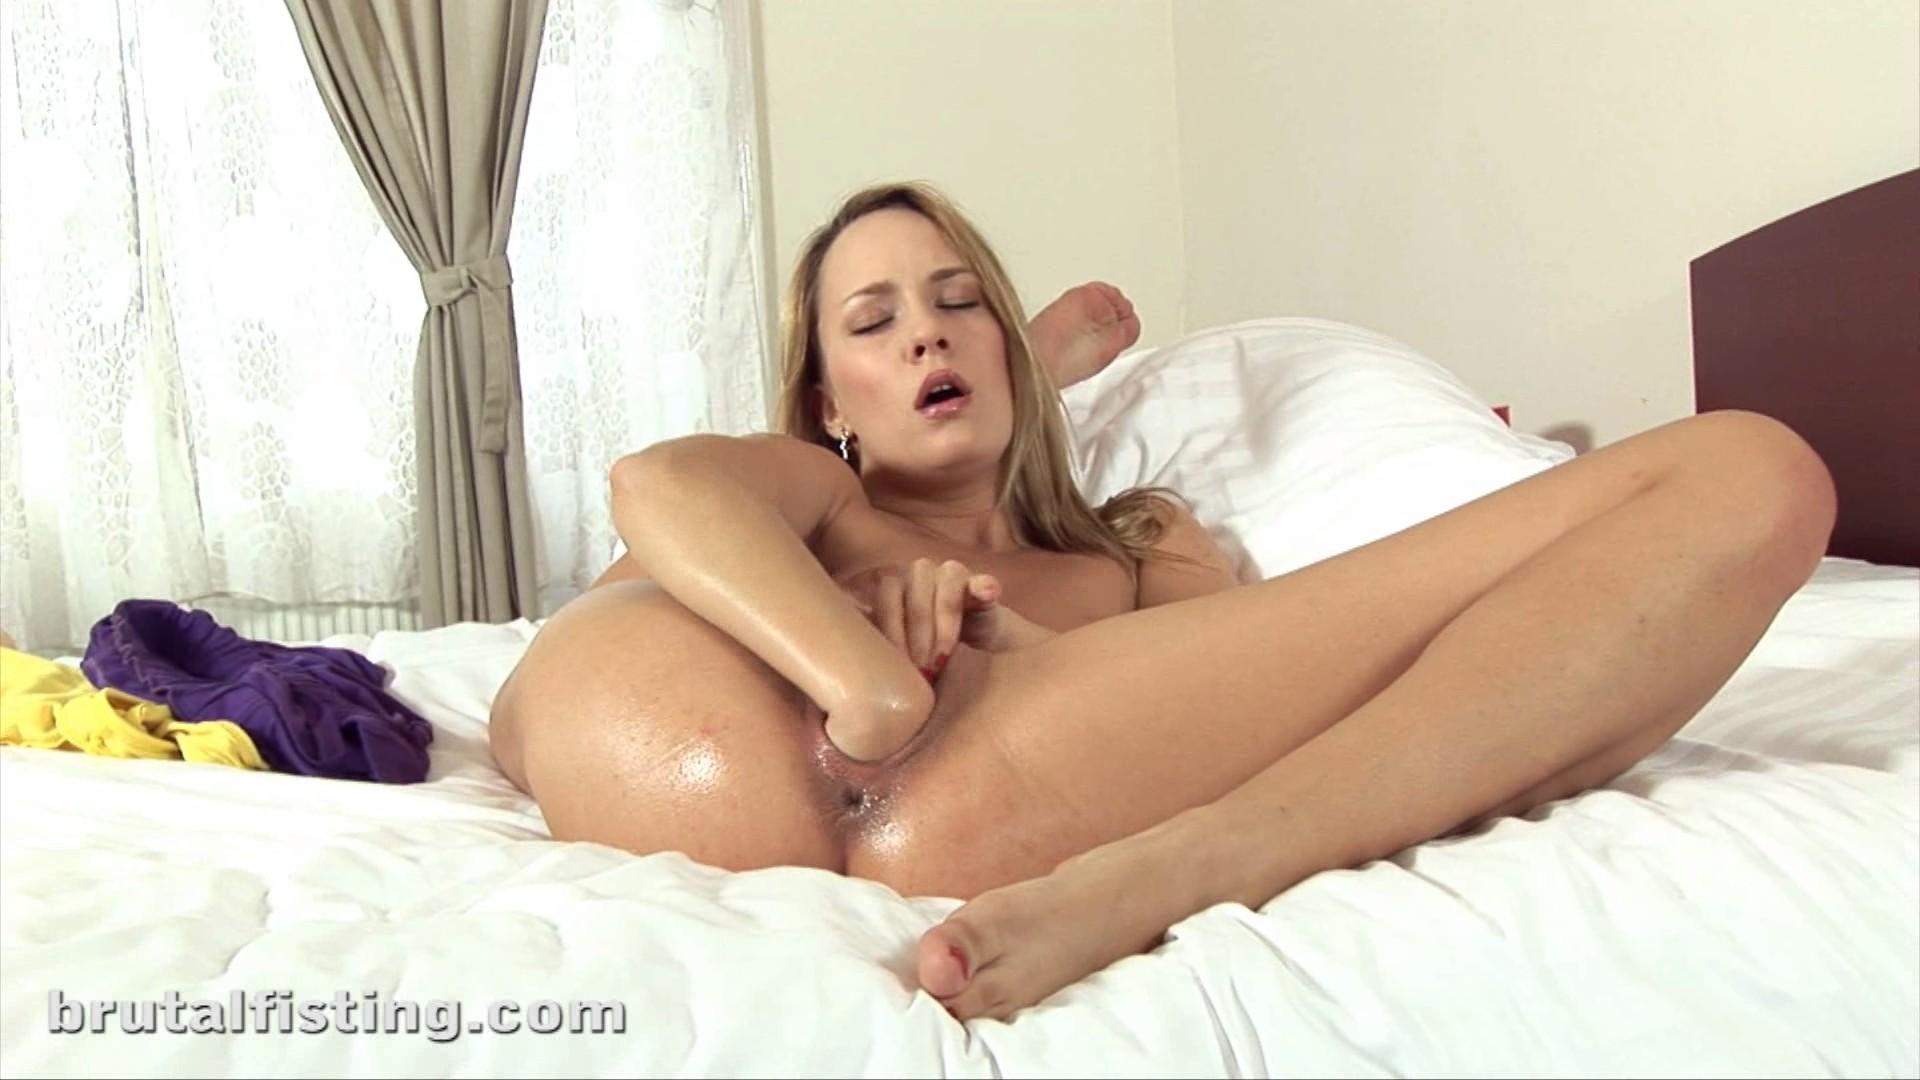 Онлайн фильм мастурбация